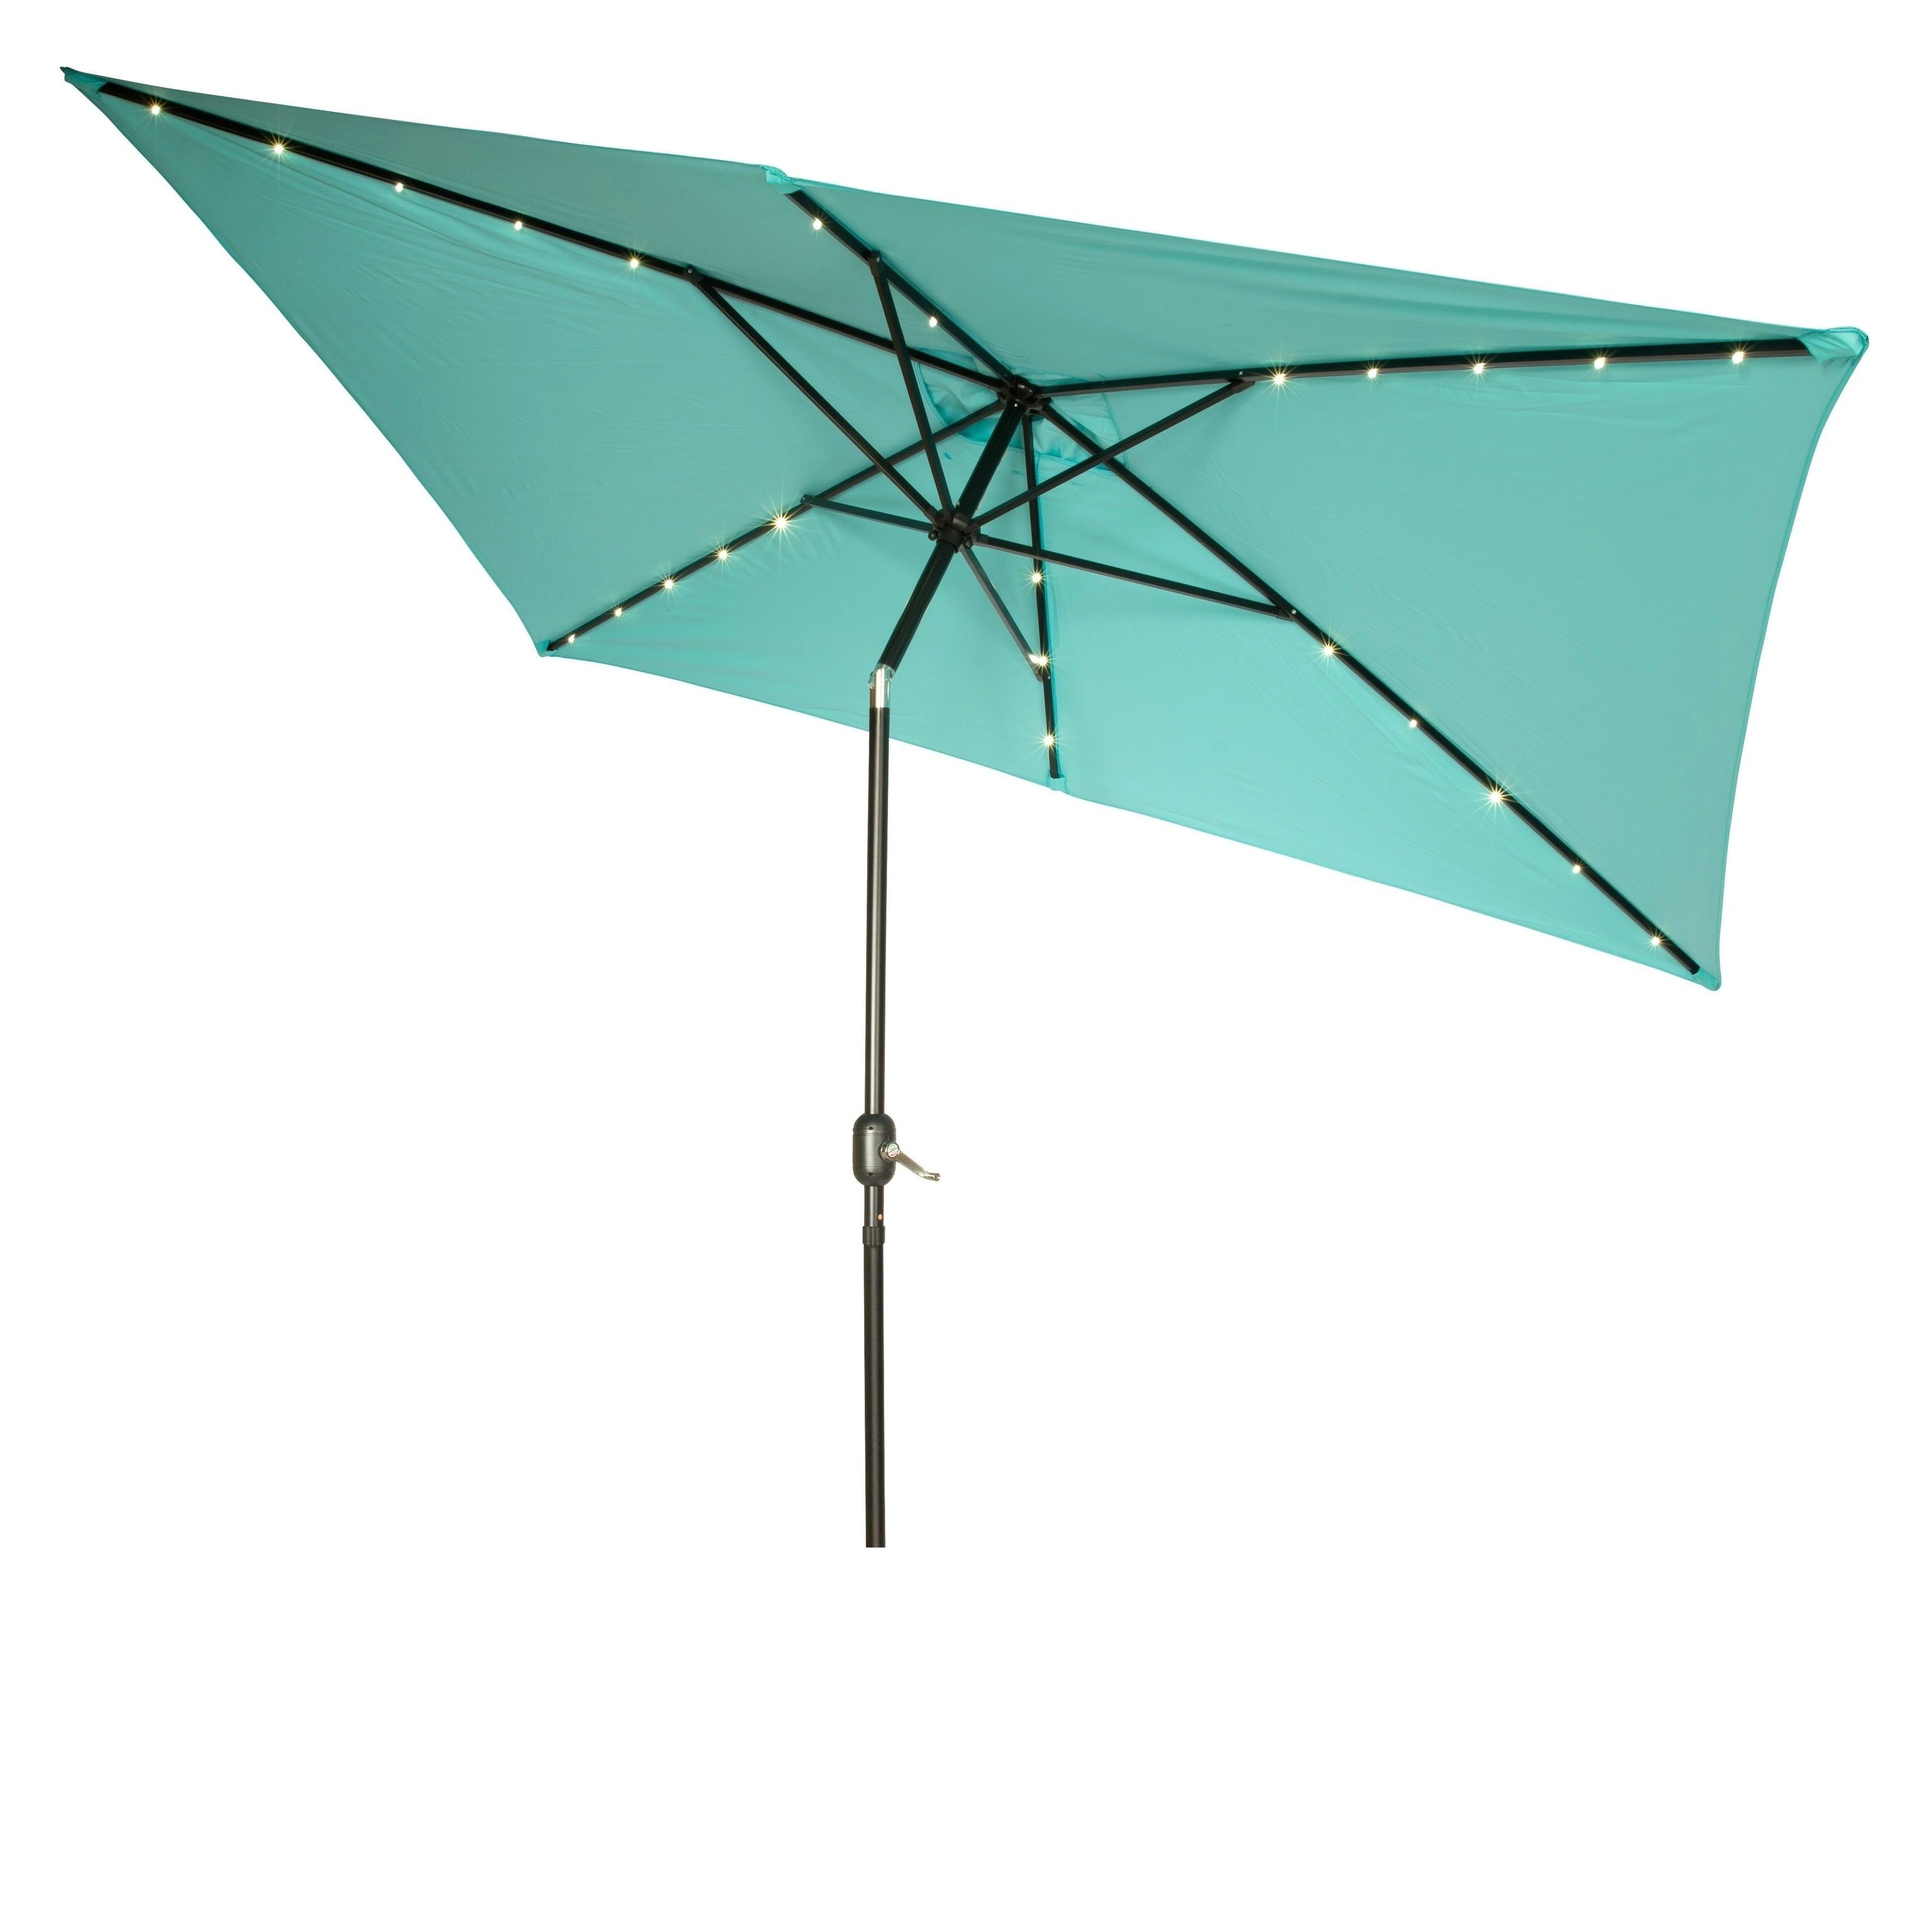 2019 Rectangular Solar Powered Led Lighted Patio Umbrella – 10' X 6.5 For Lighted Patio Umbrellas (Gallery 18 of 20)